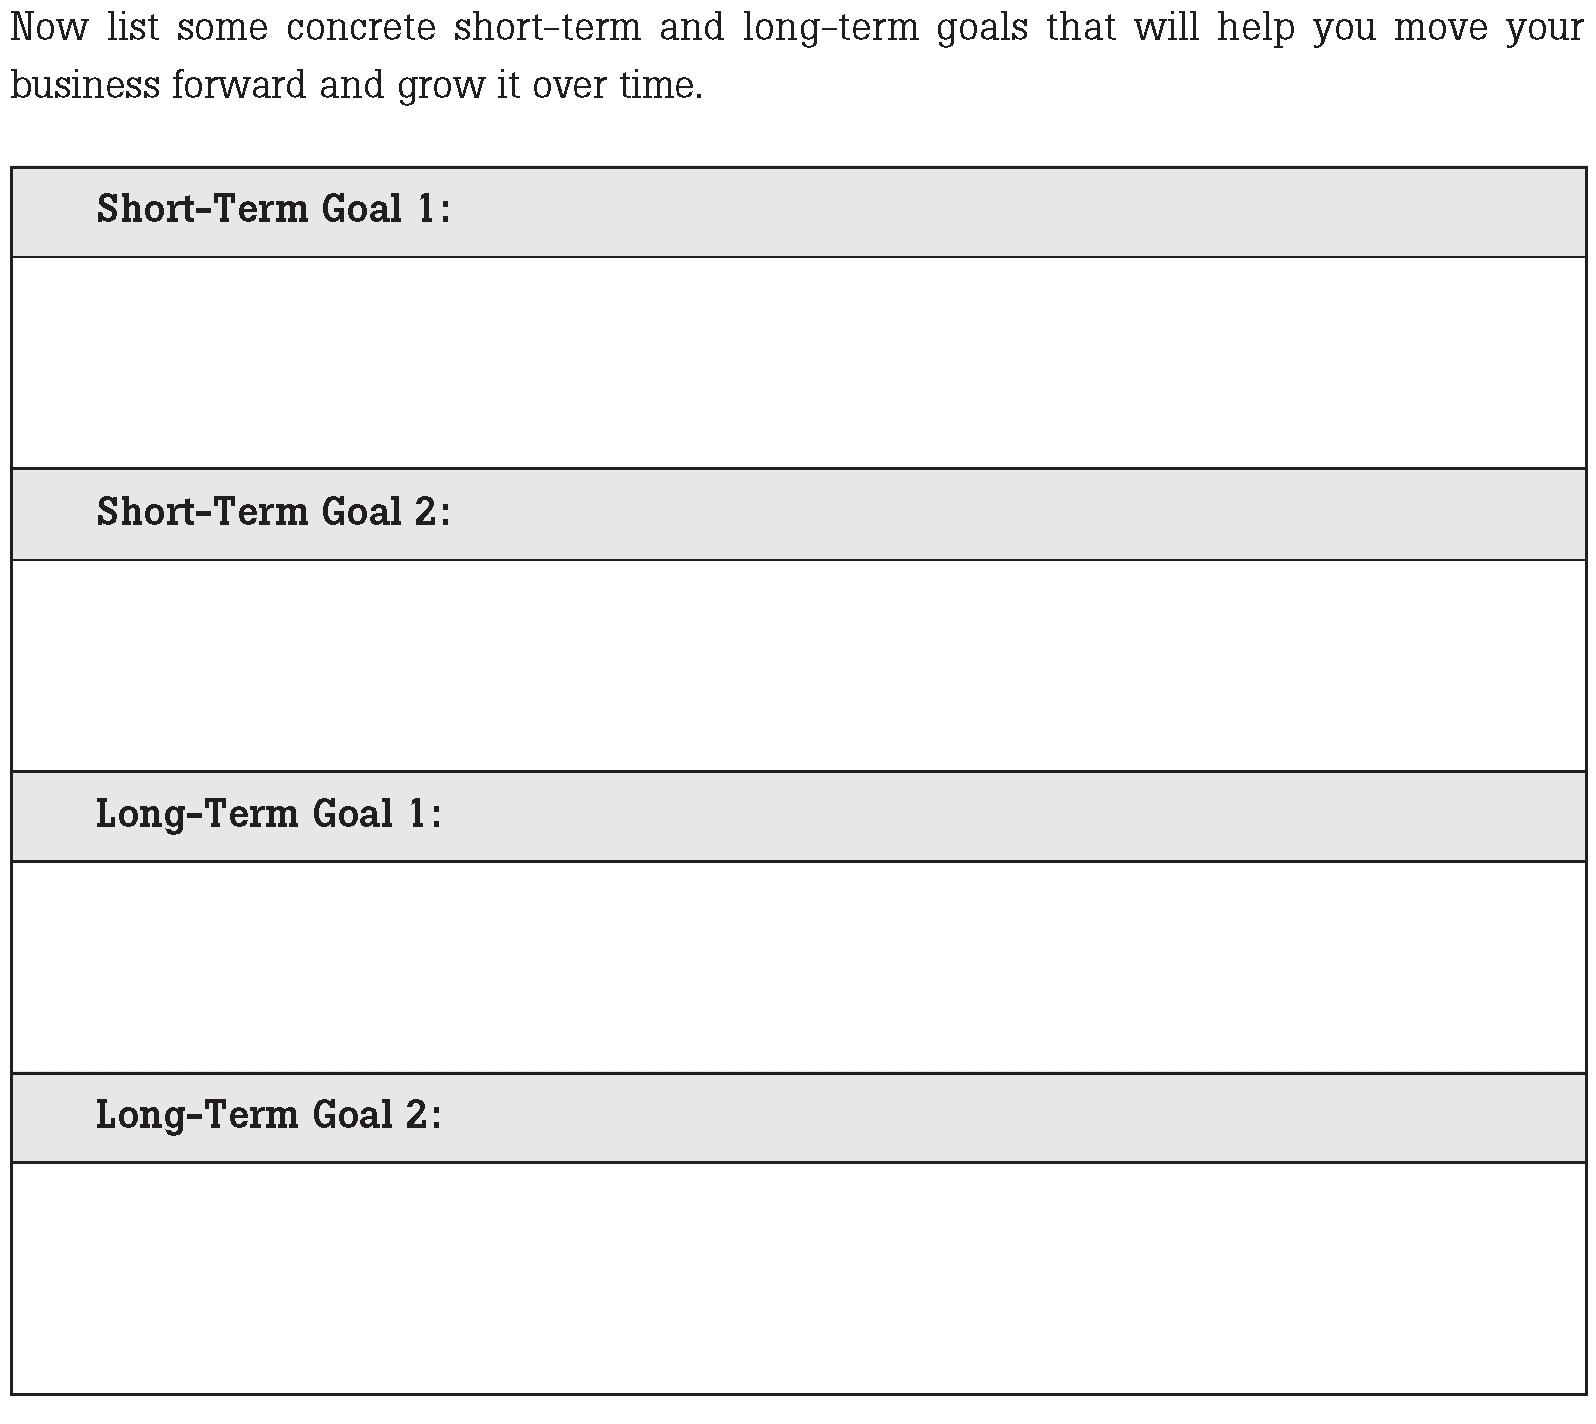 Worksheets Short And Long Term Goals Worksheet short and long term goals worksheet free worksheets library 17 best ideas about goal setting on pinterest goals